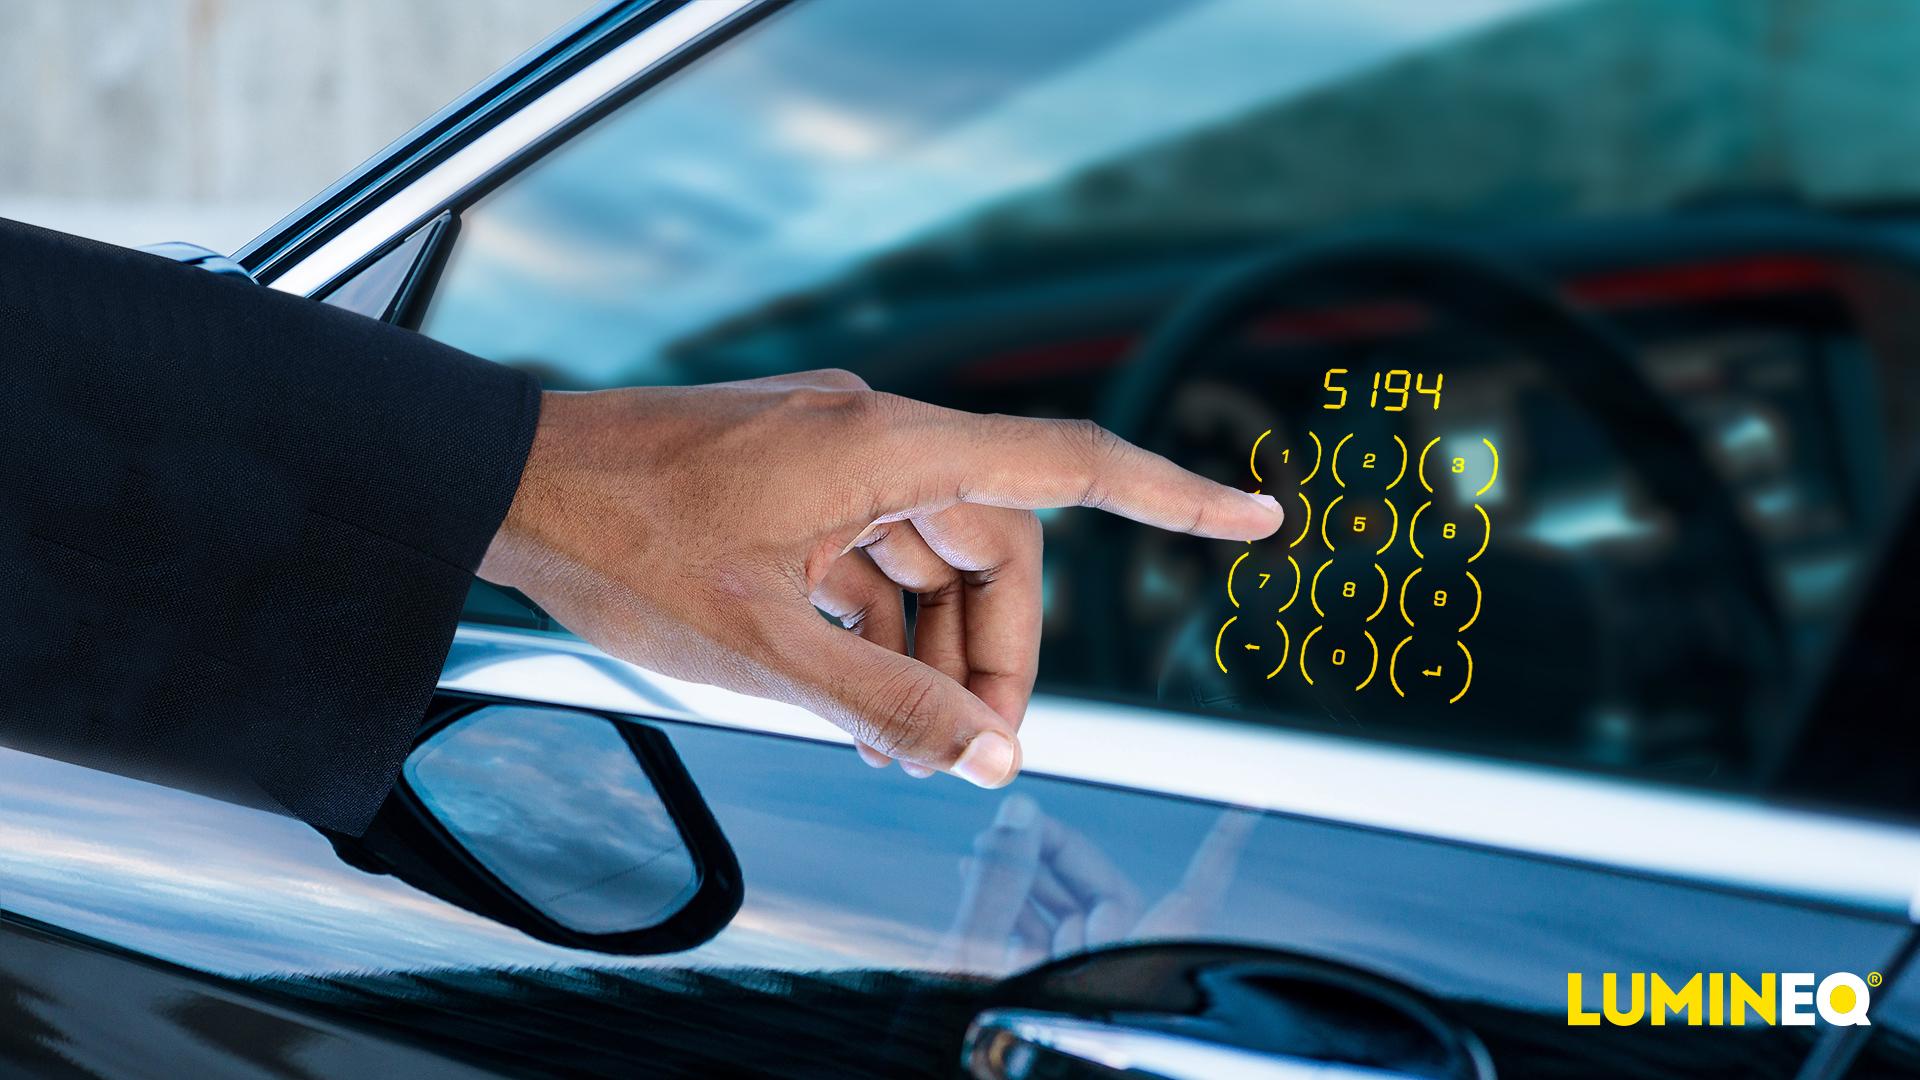 Car_side_window-touch_keypad-2021-1920x1080